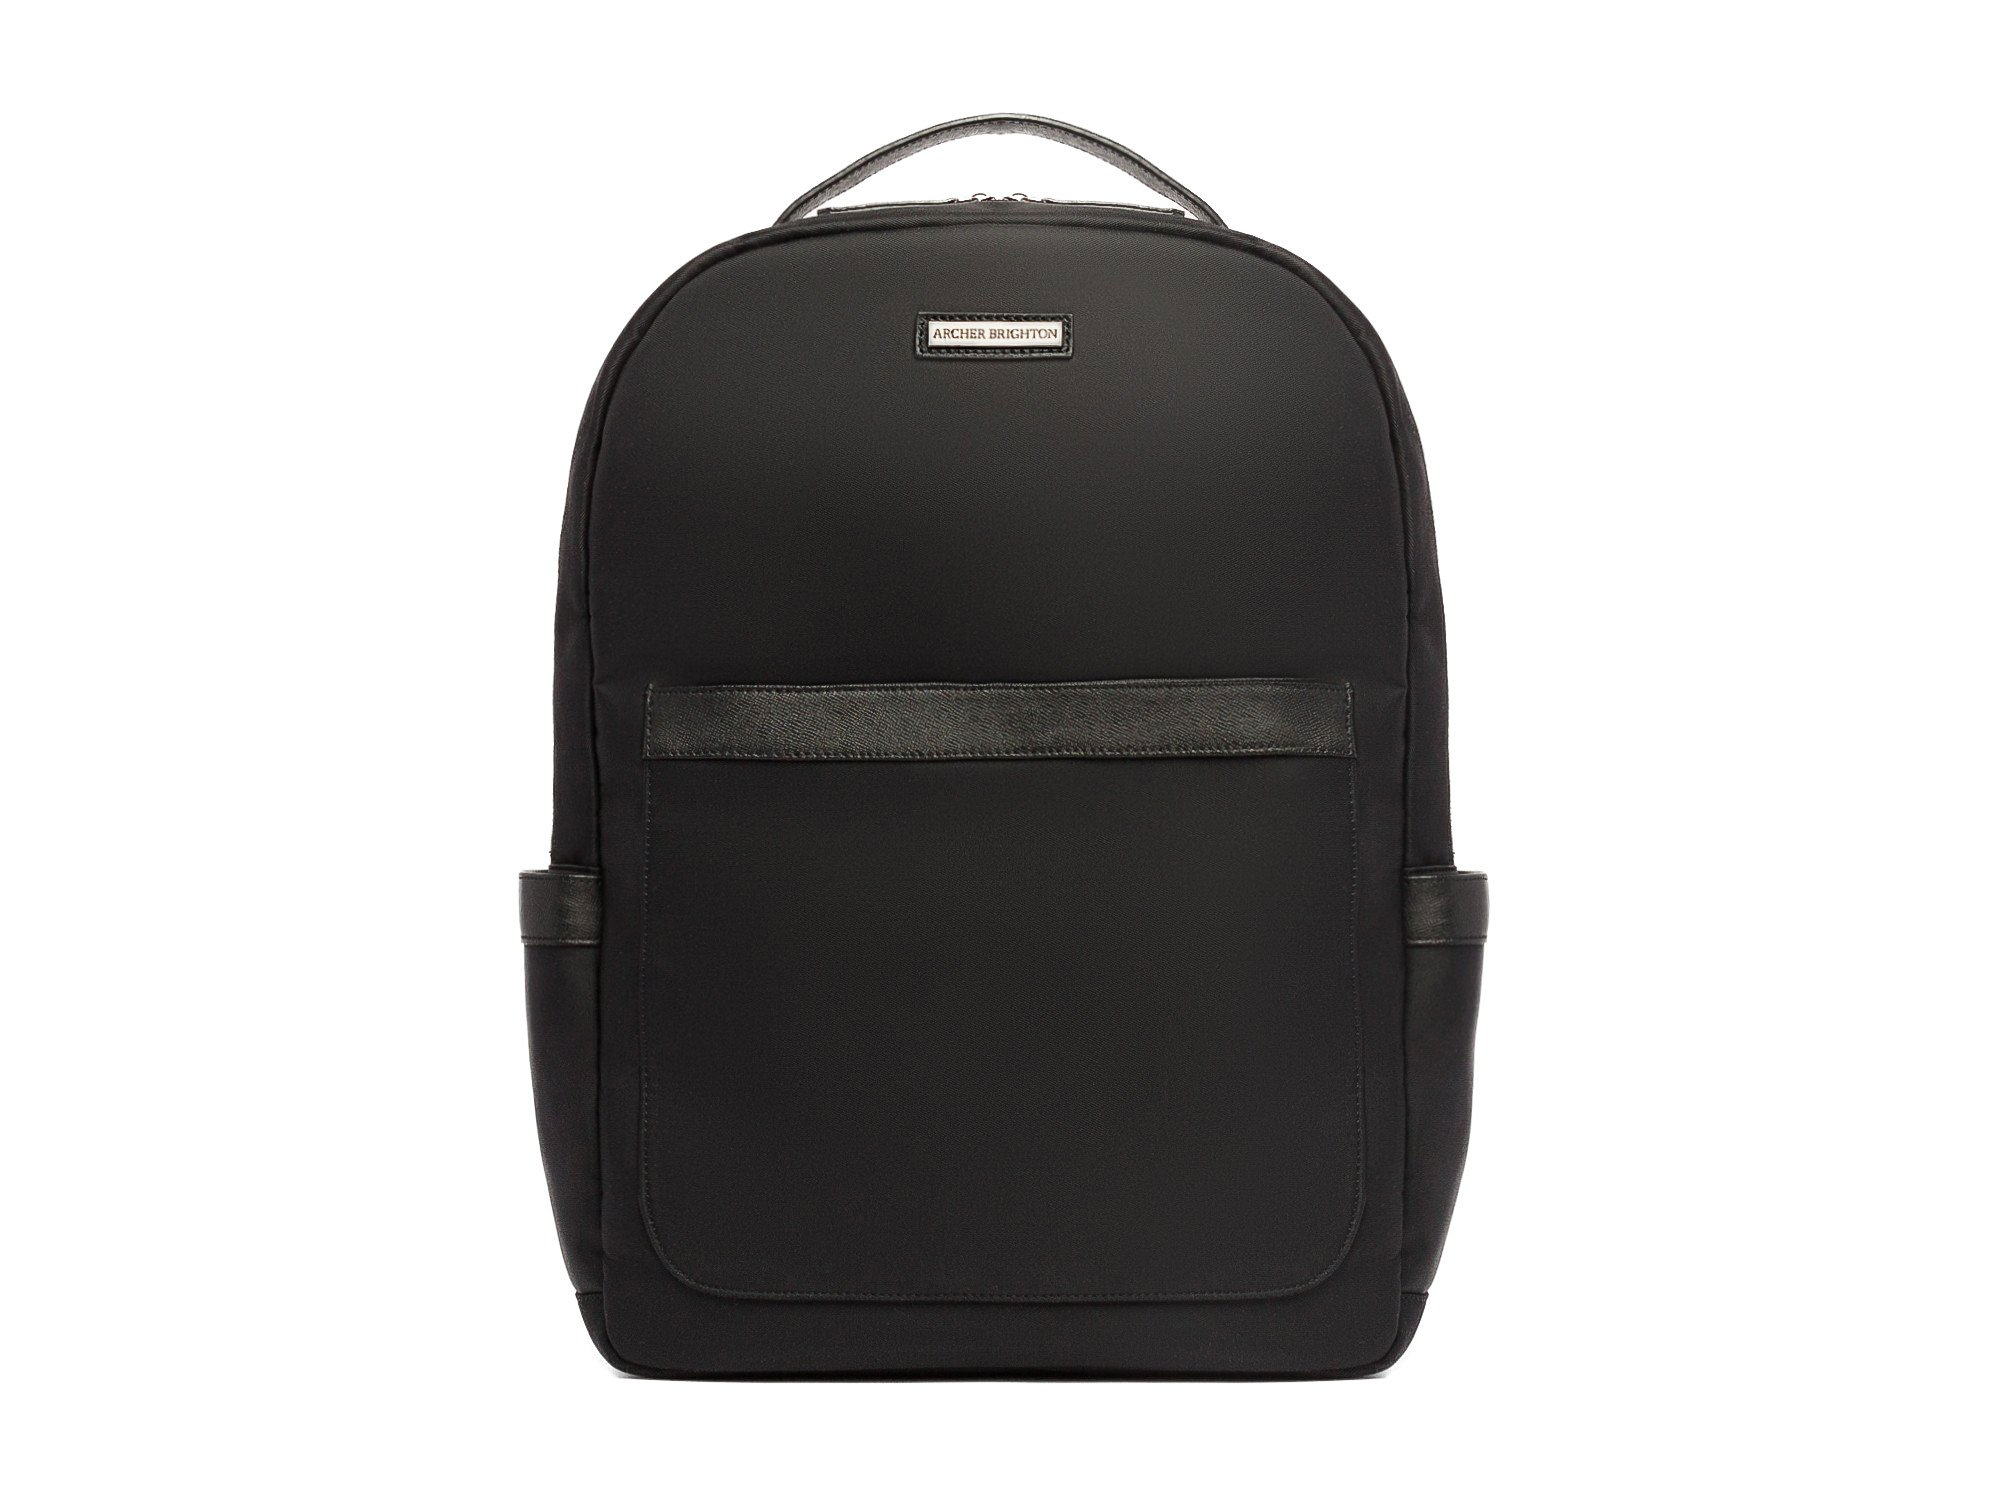 "Archer Brighton Jake Laptop Backpack, Men's 15"" Business TSA Travel Leather Canvas Multipurpose Backpack (Black)"